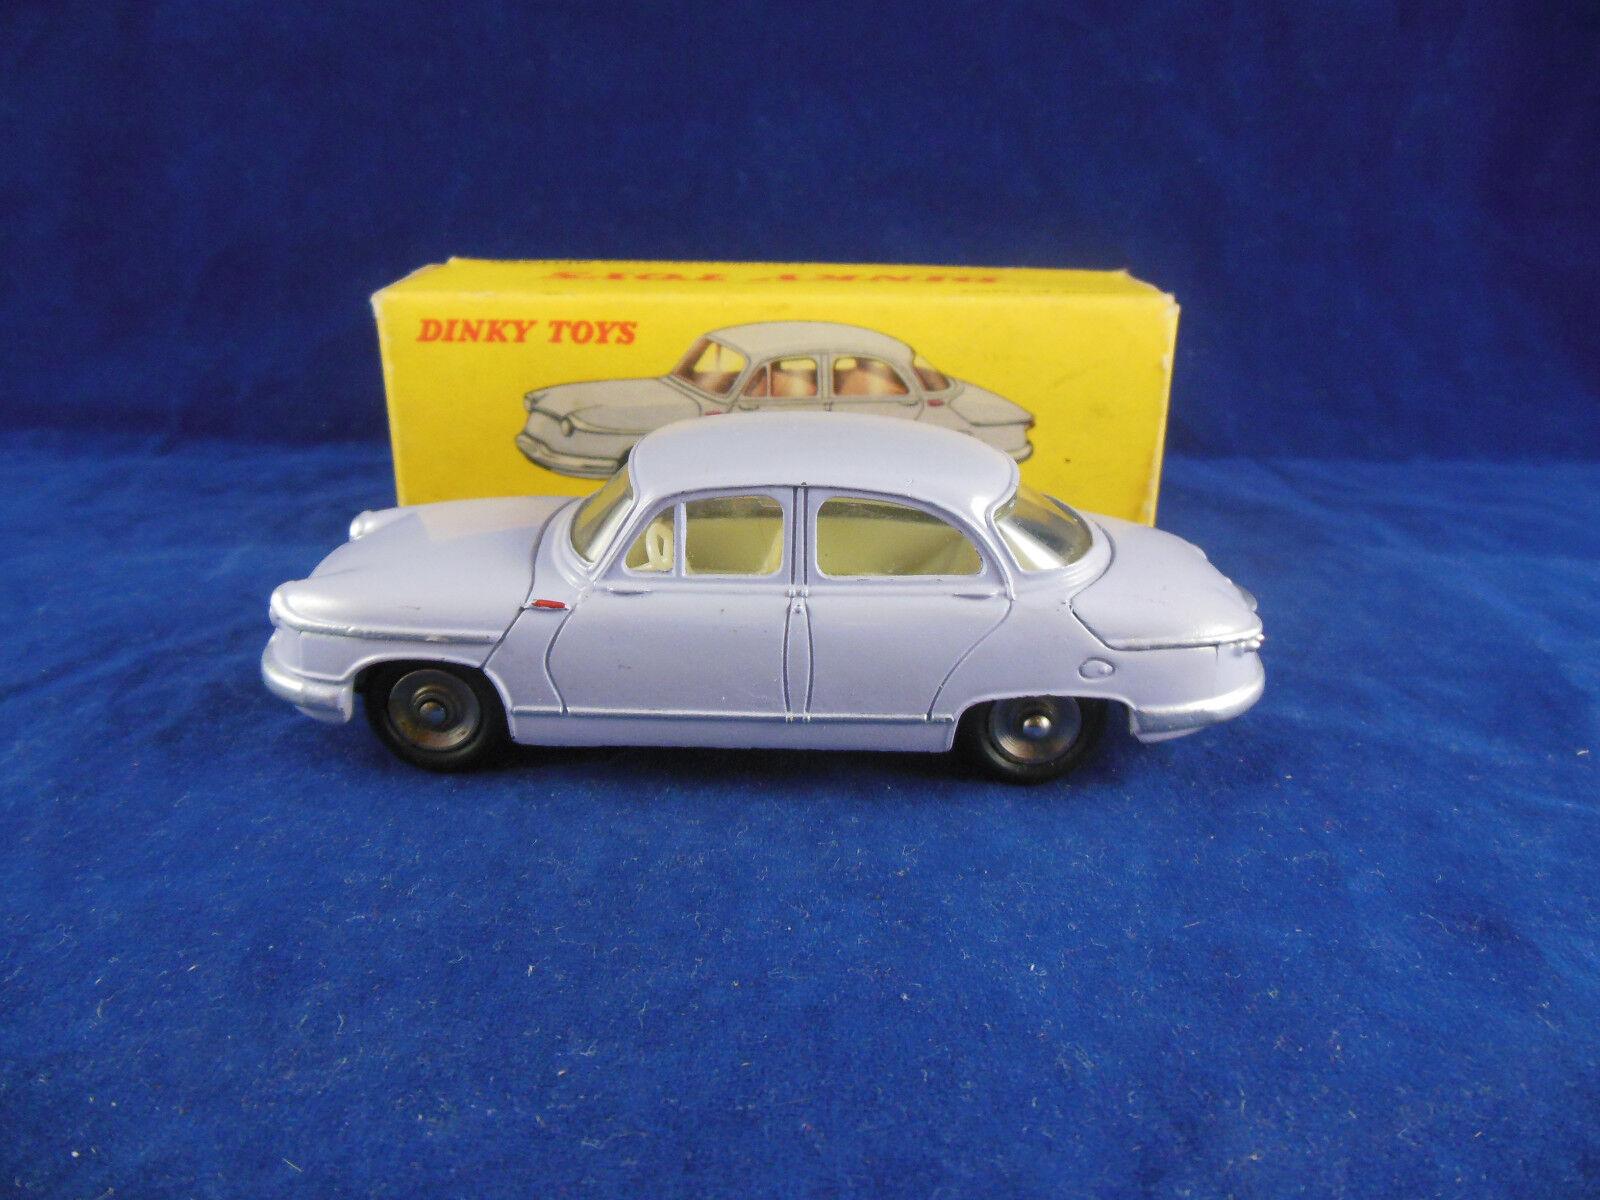 Dinky Toys 547 Panhard PL17 in purplec Vintage in Superb Original Condition 1960's